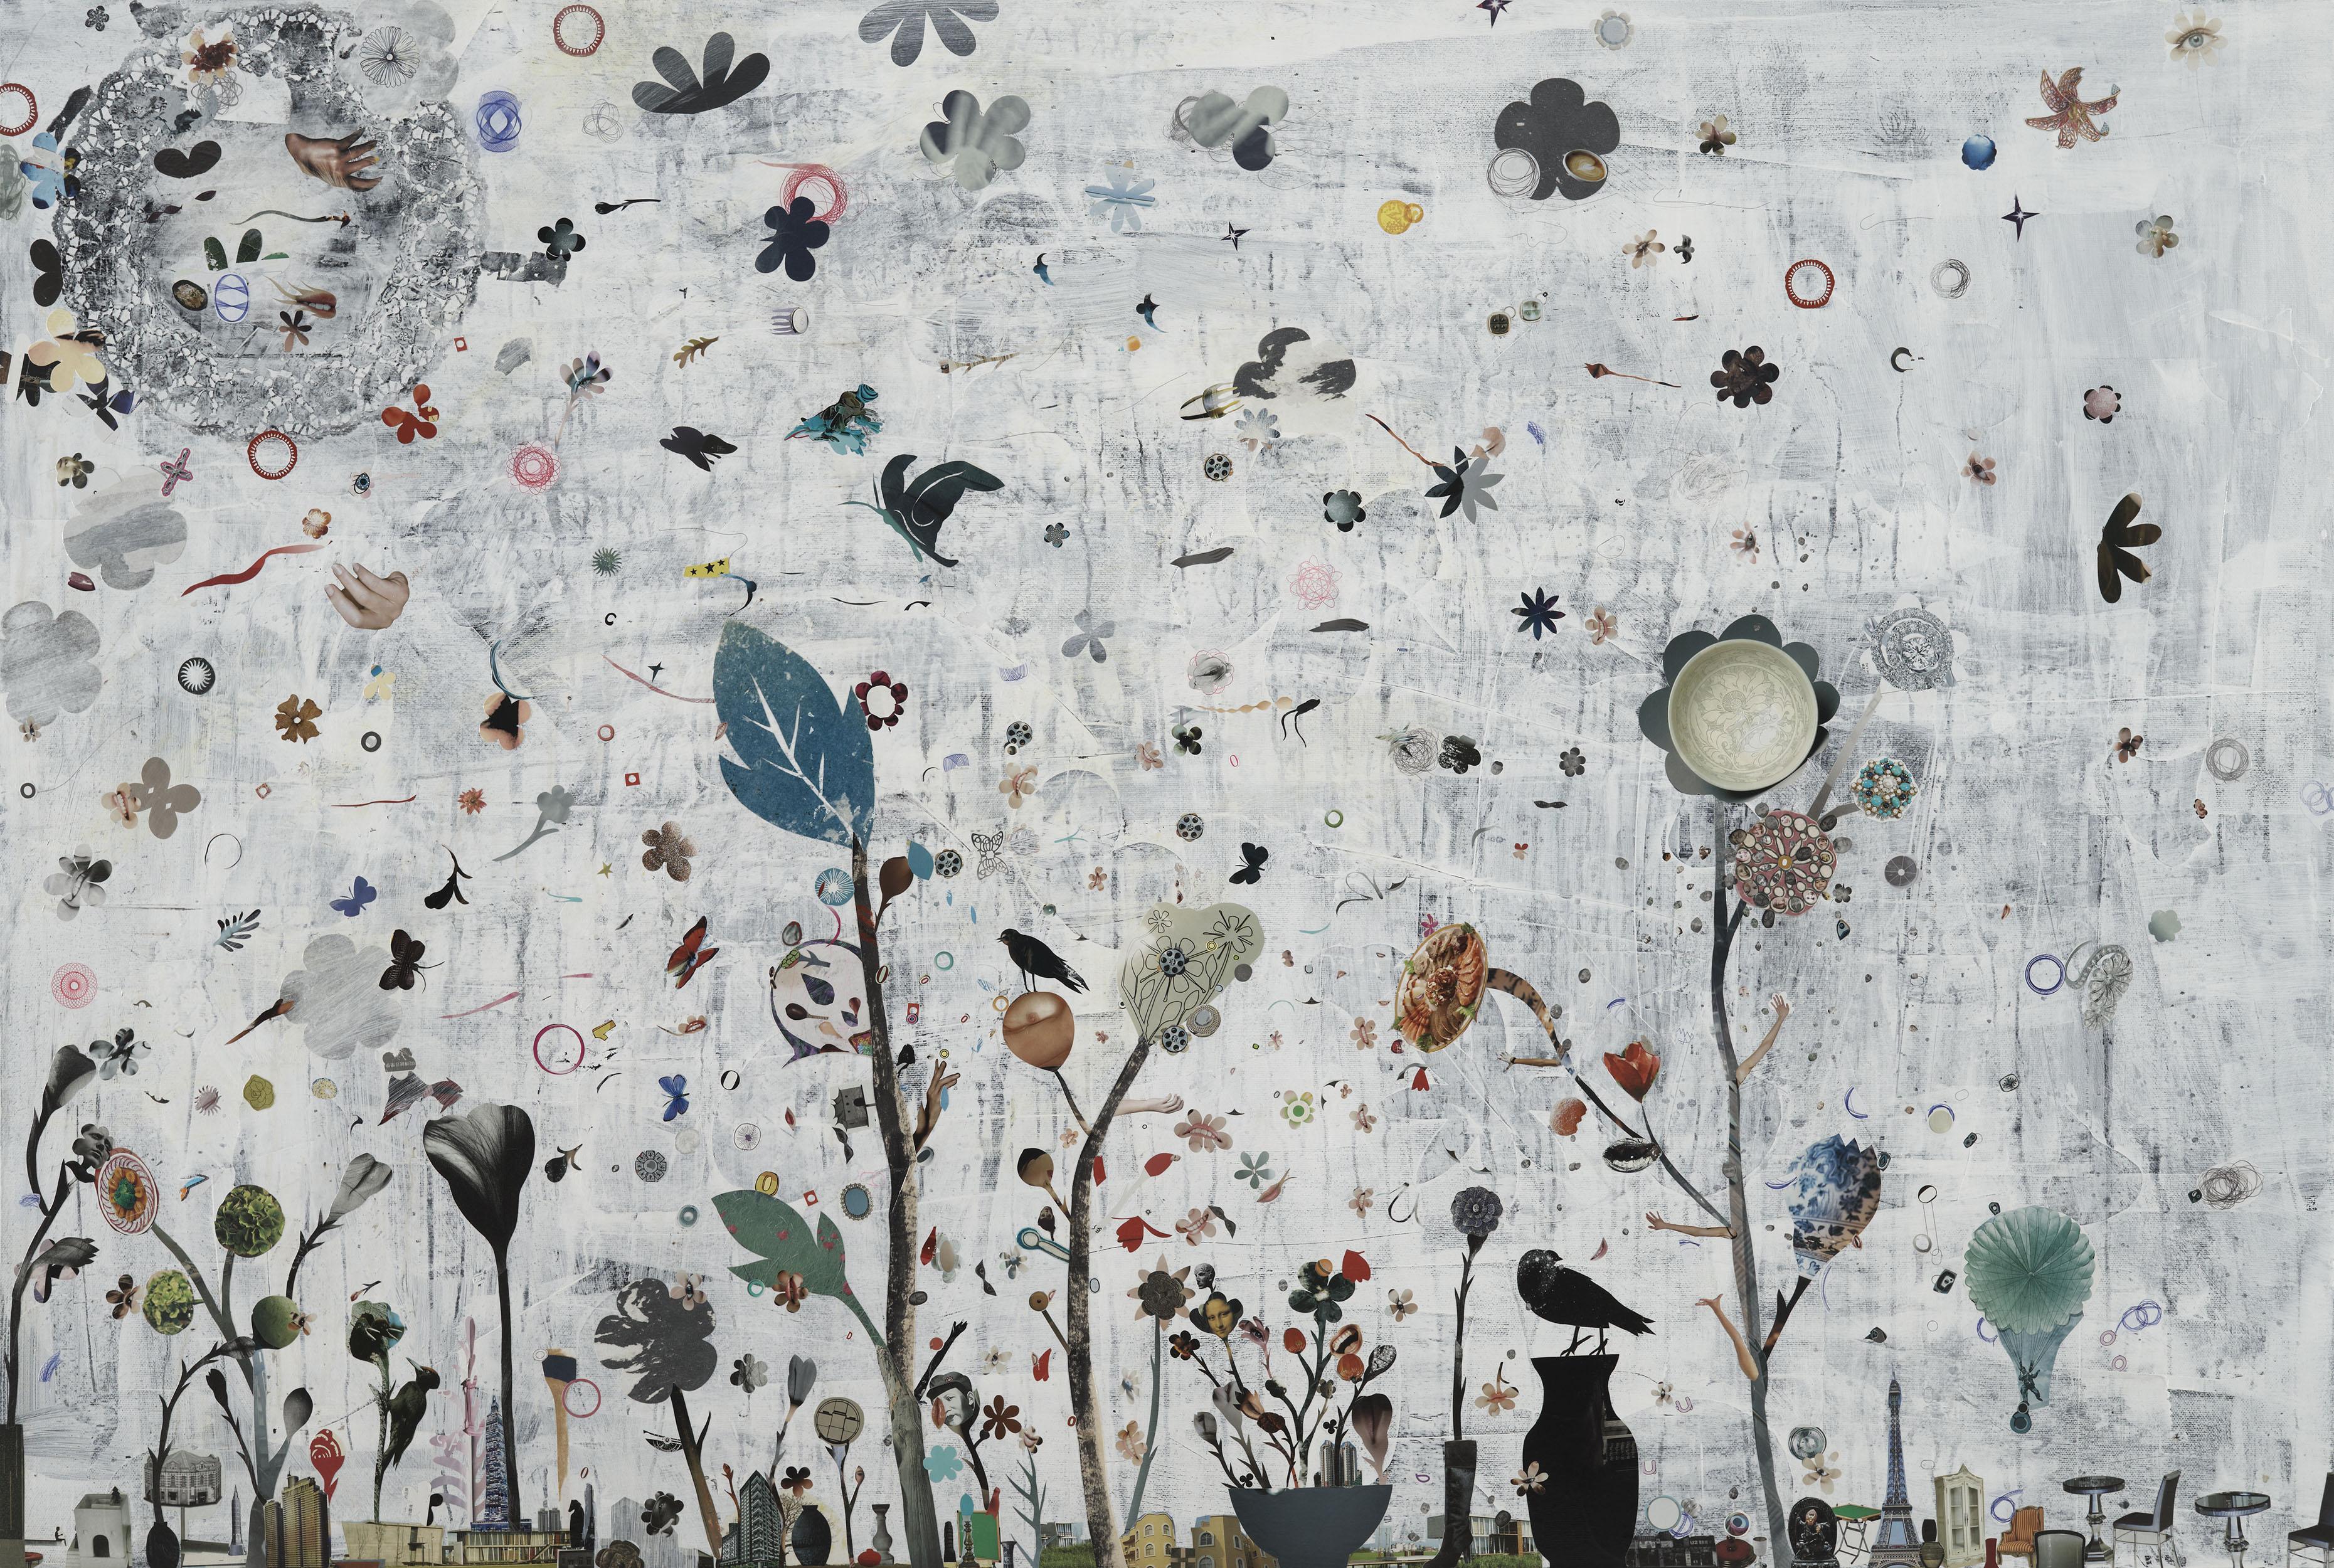 LIU Shih-tung, Mixed Media  | Vase Landscape II   130x194 cm, 2011 的圖說